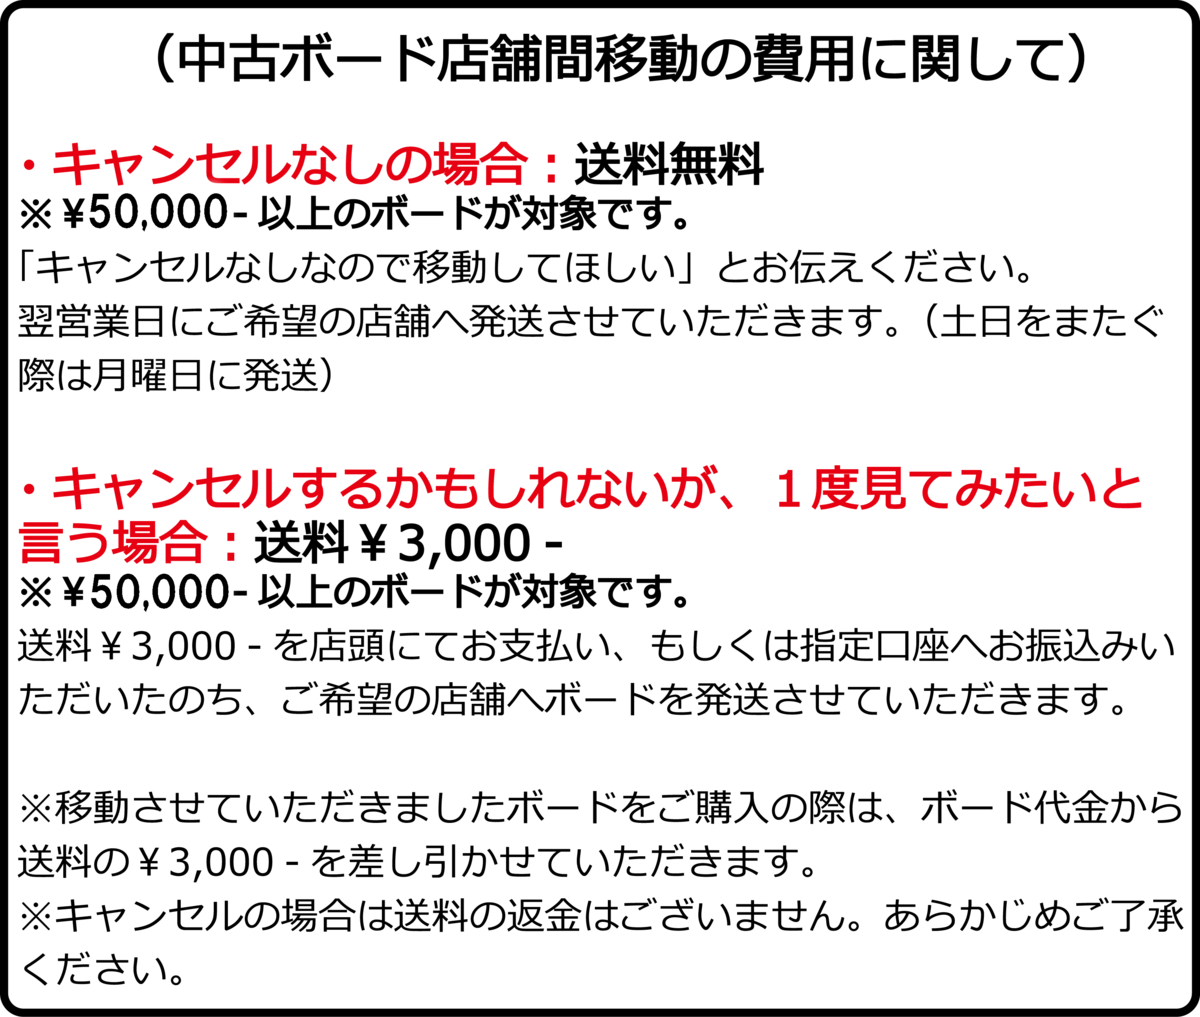 f:id:SEAKONG:20210123103003p:plain